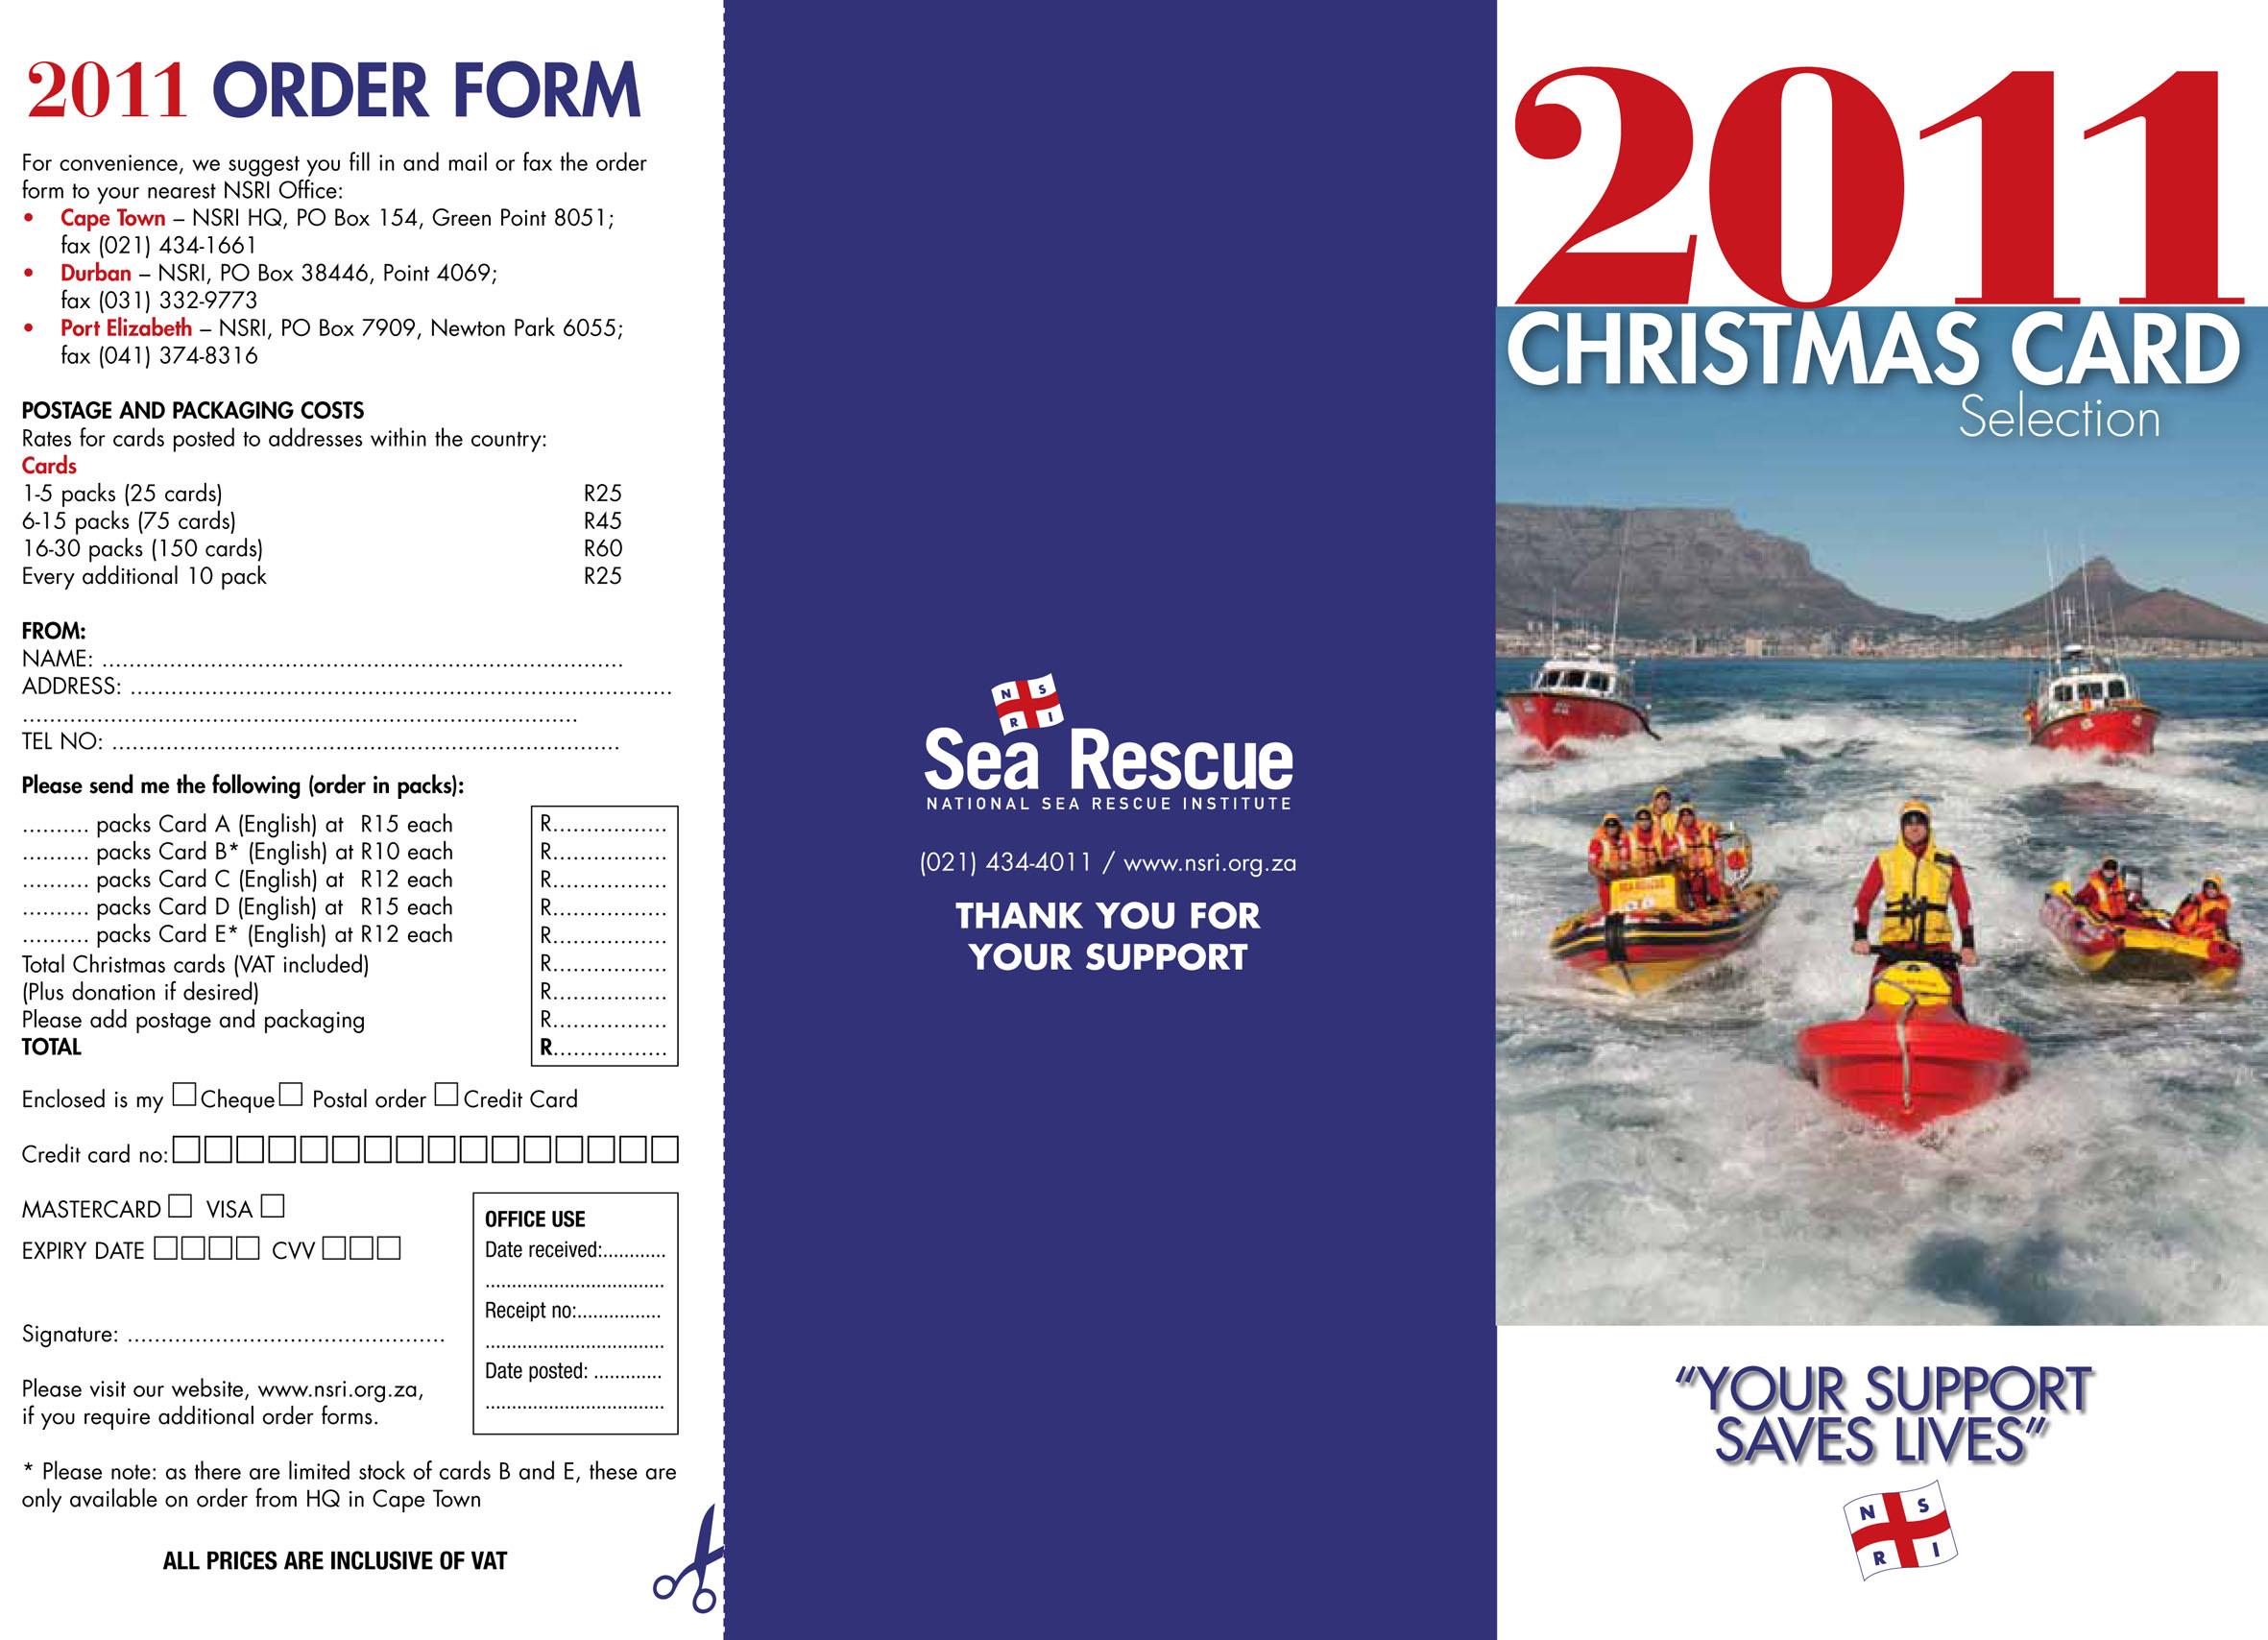 2011 Sea Rescue Christmas cards - NSRI